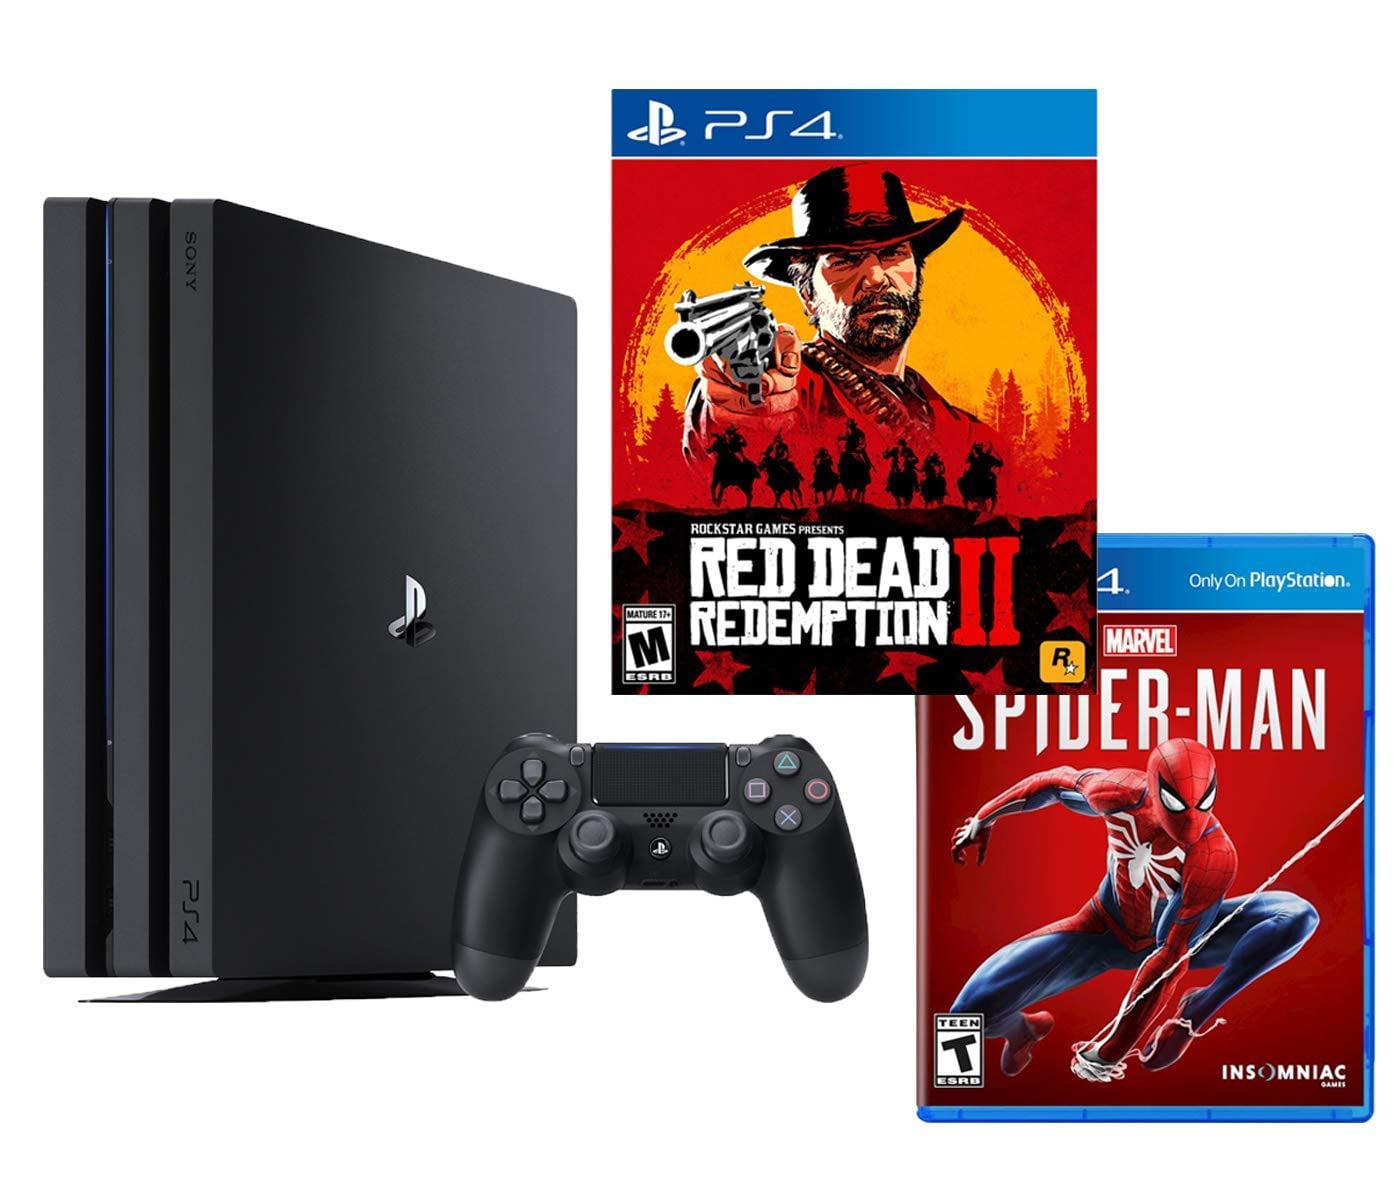 Playstation 4 Pro Red Dead And Spider Man Bundle Red Dead Redemption 2 Marvel S Spider Man Playstation 4 Pro 4k Hdr 1tb Console Walmart Com Walmart Com